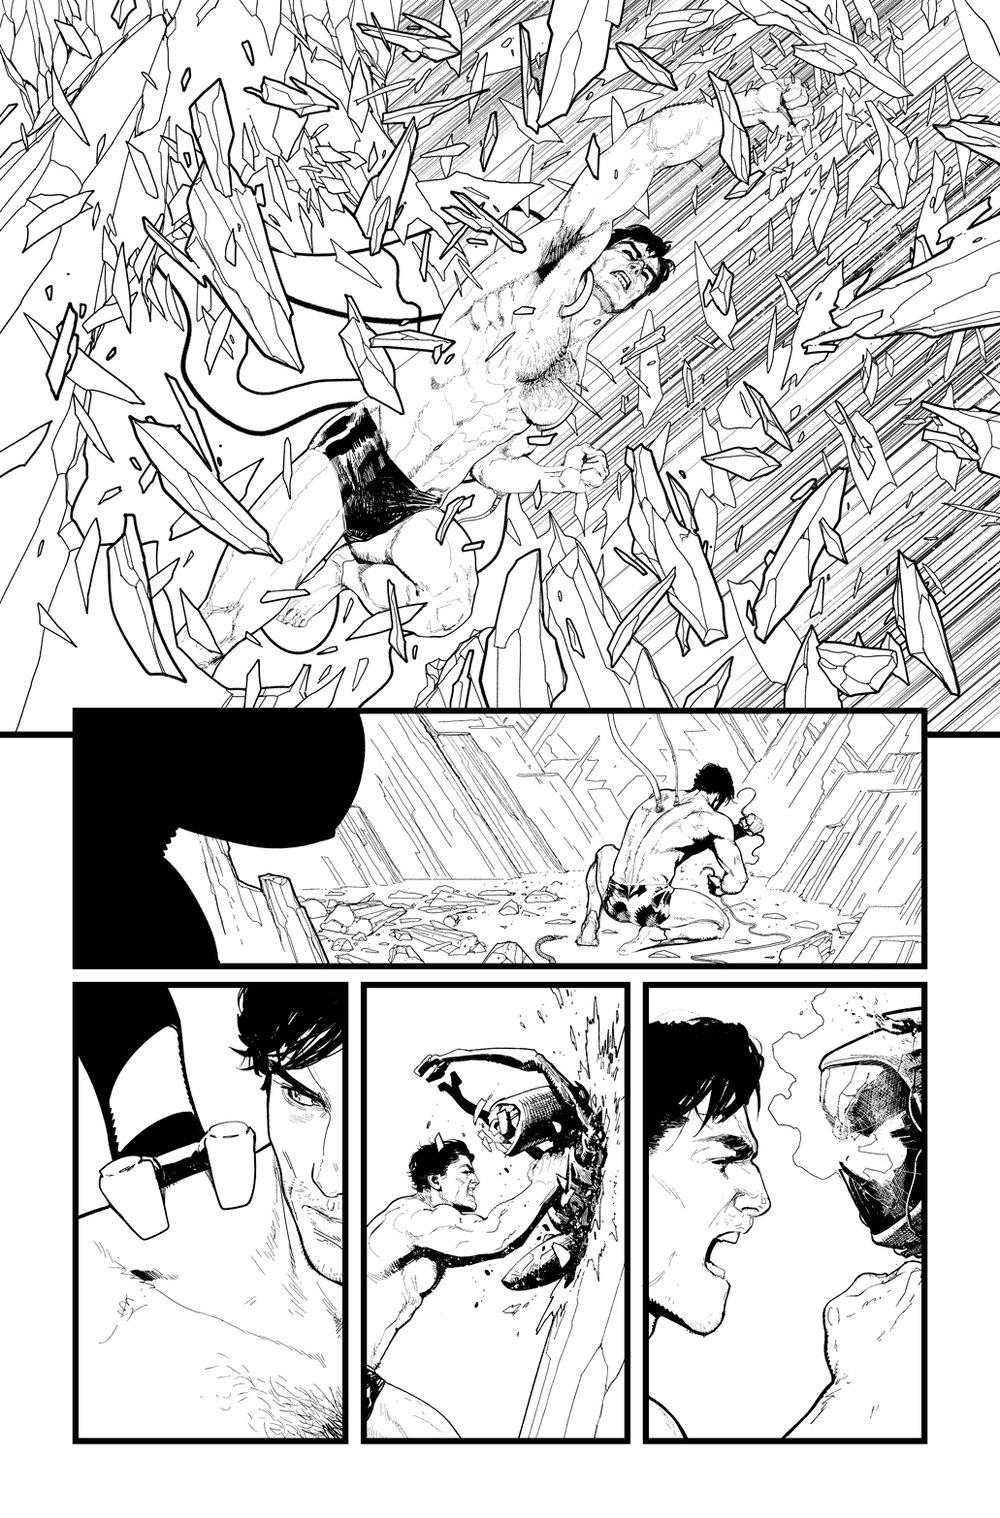 Image of BATMAN/SUPERMAN #2 p.13 ARTIST'S PROOF